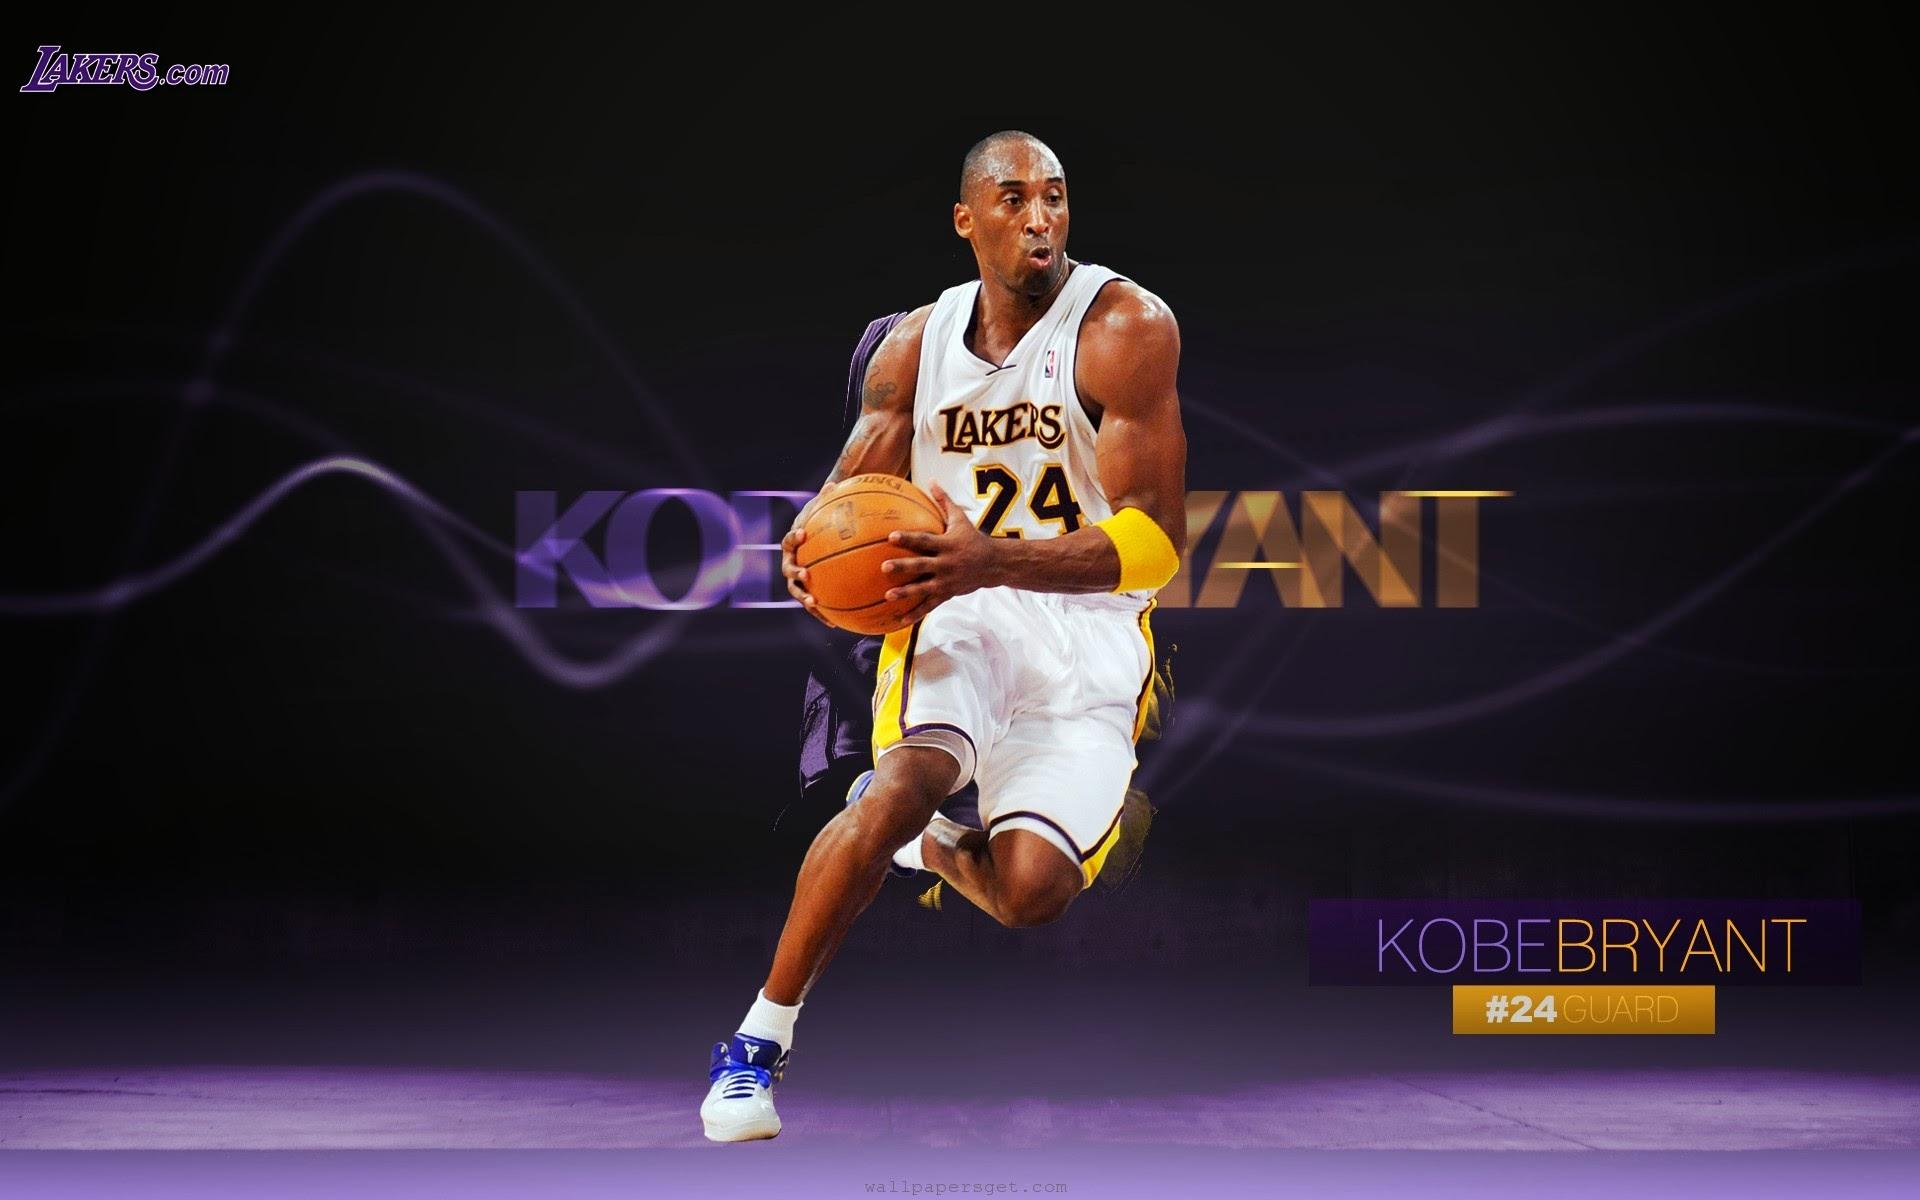 Kobe Bryant 2014 Wallpaper HiresMOVIEWALLcom 1920x1200